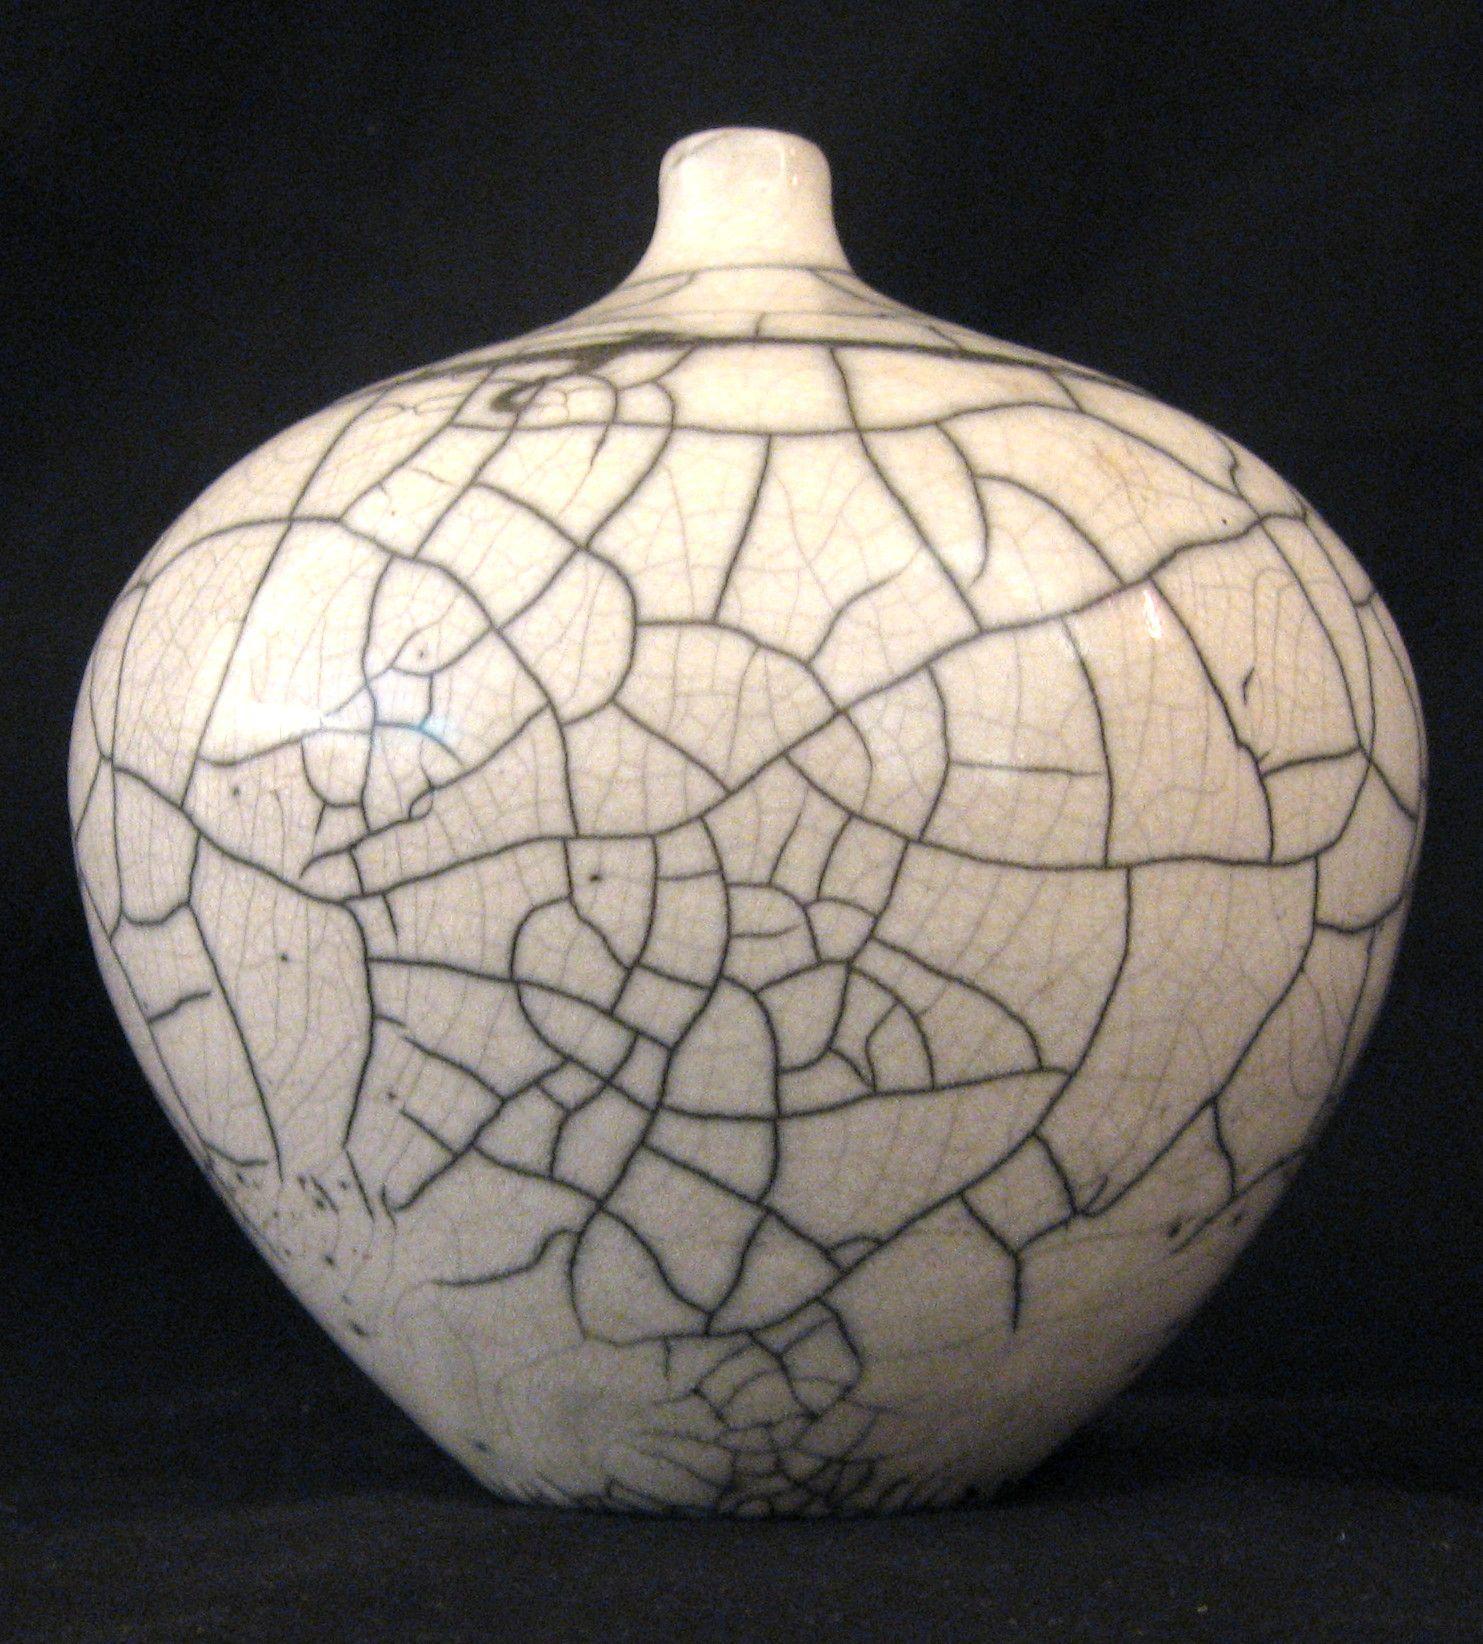 Raku Crackle Glaze Artist Unknown Raku Ceramic Pottery Pottery Ceramic Art